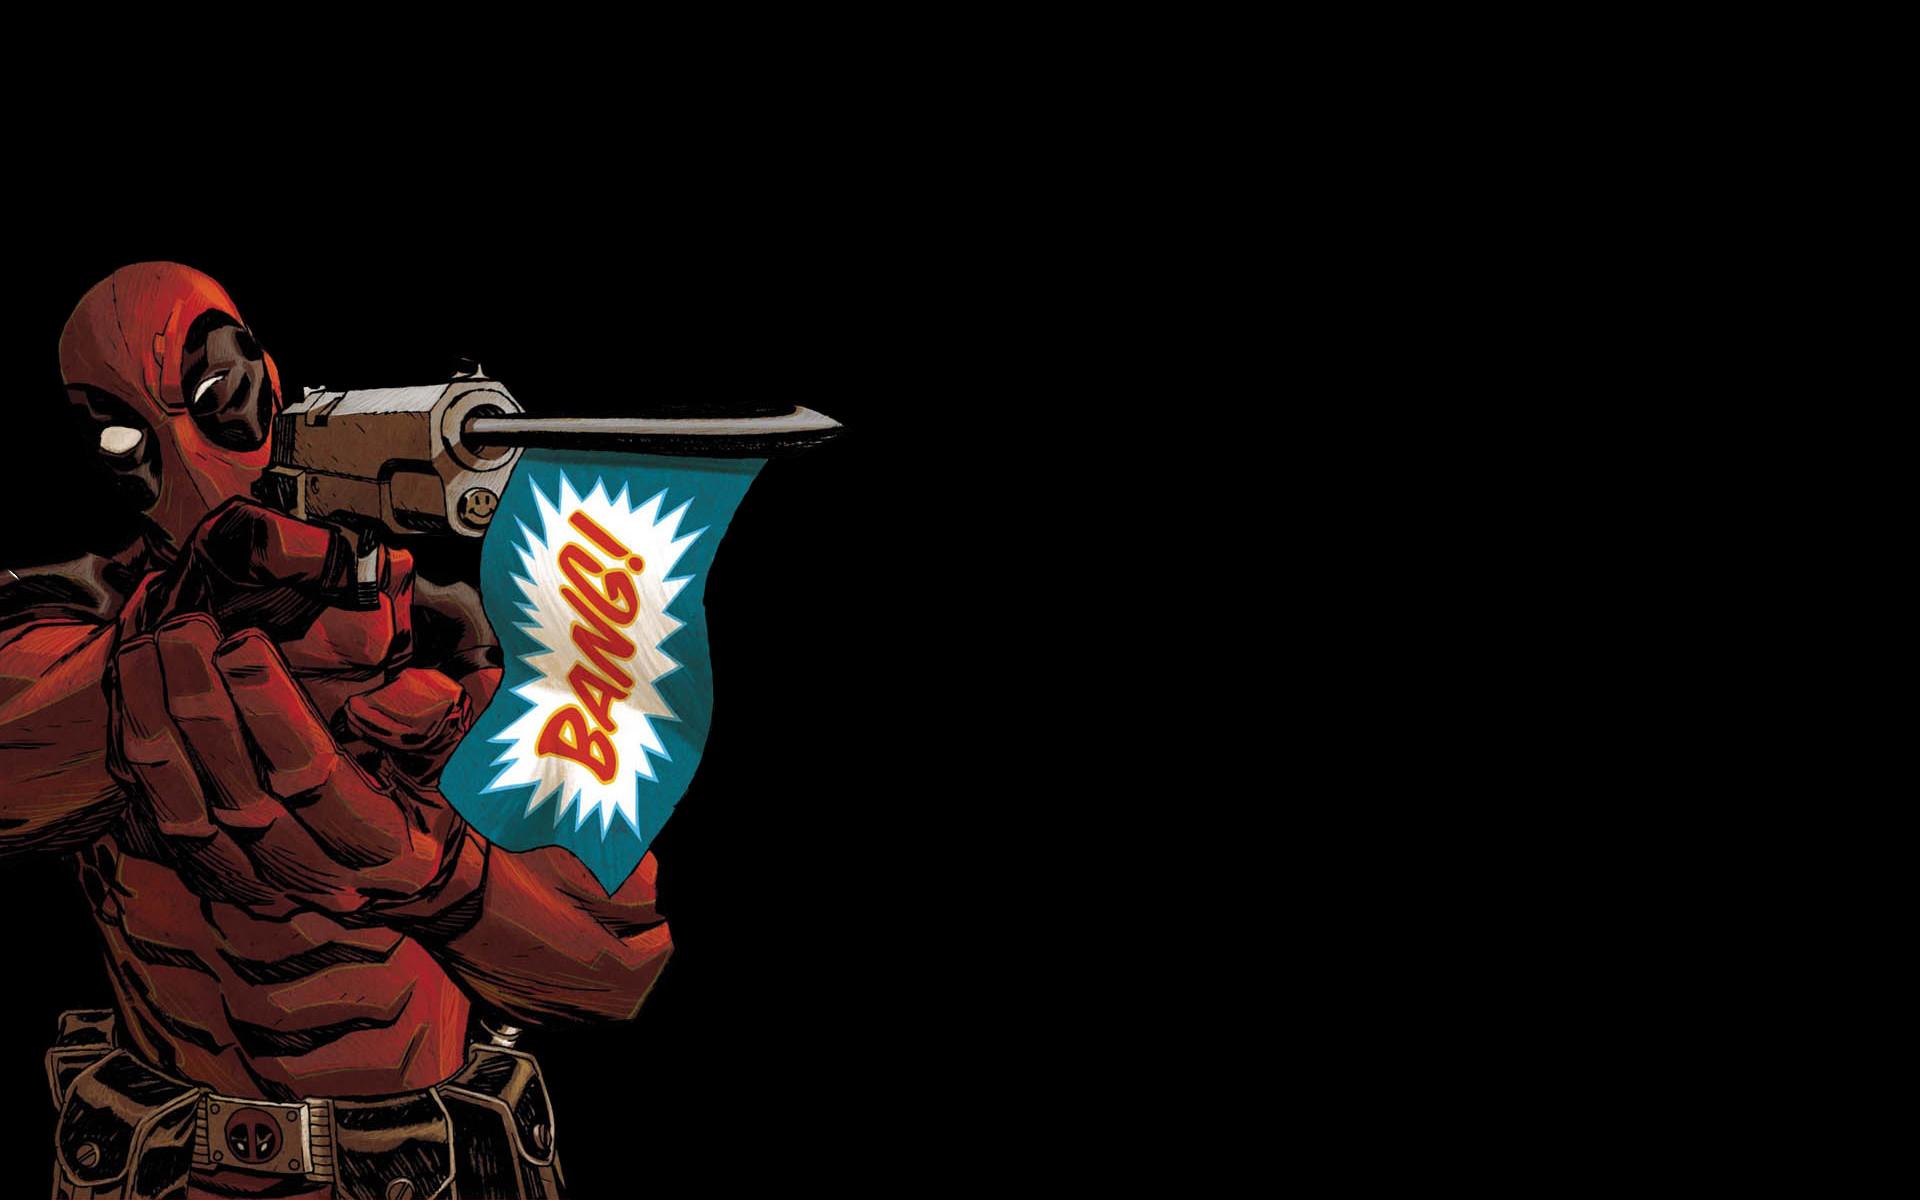 Amazing Wallpaper High Resolution Deadpool - 935757-deadpool-backgrounds-1920x1200-for-ipad  Image_93628.jpg